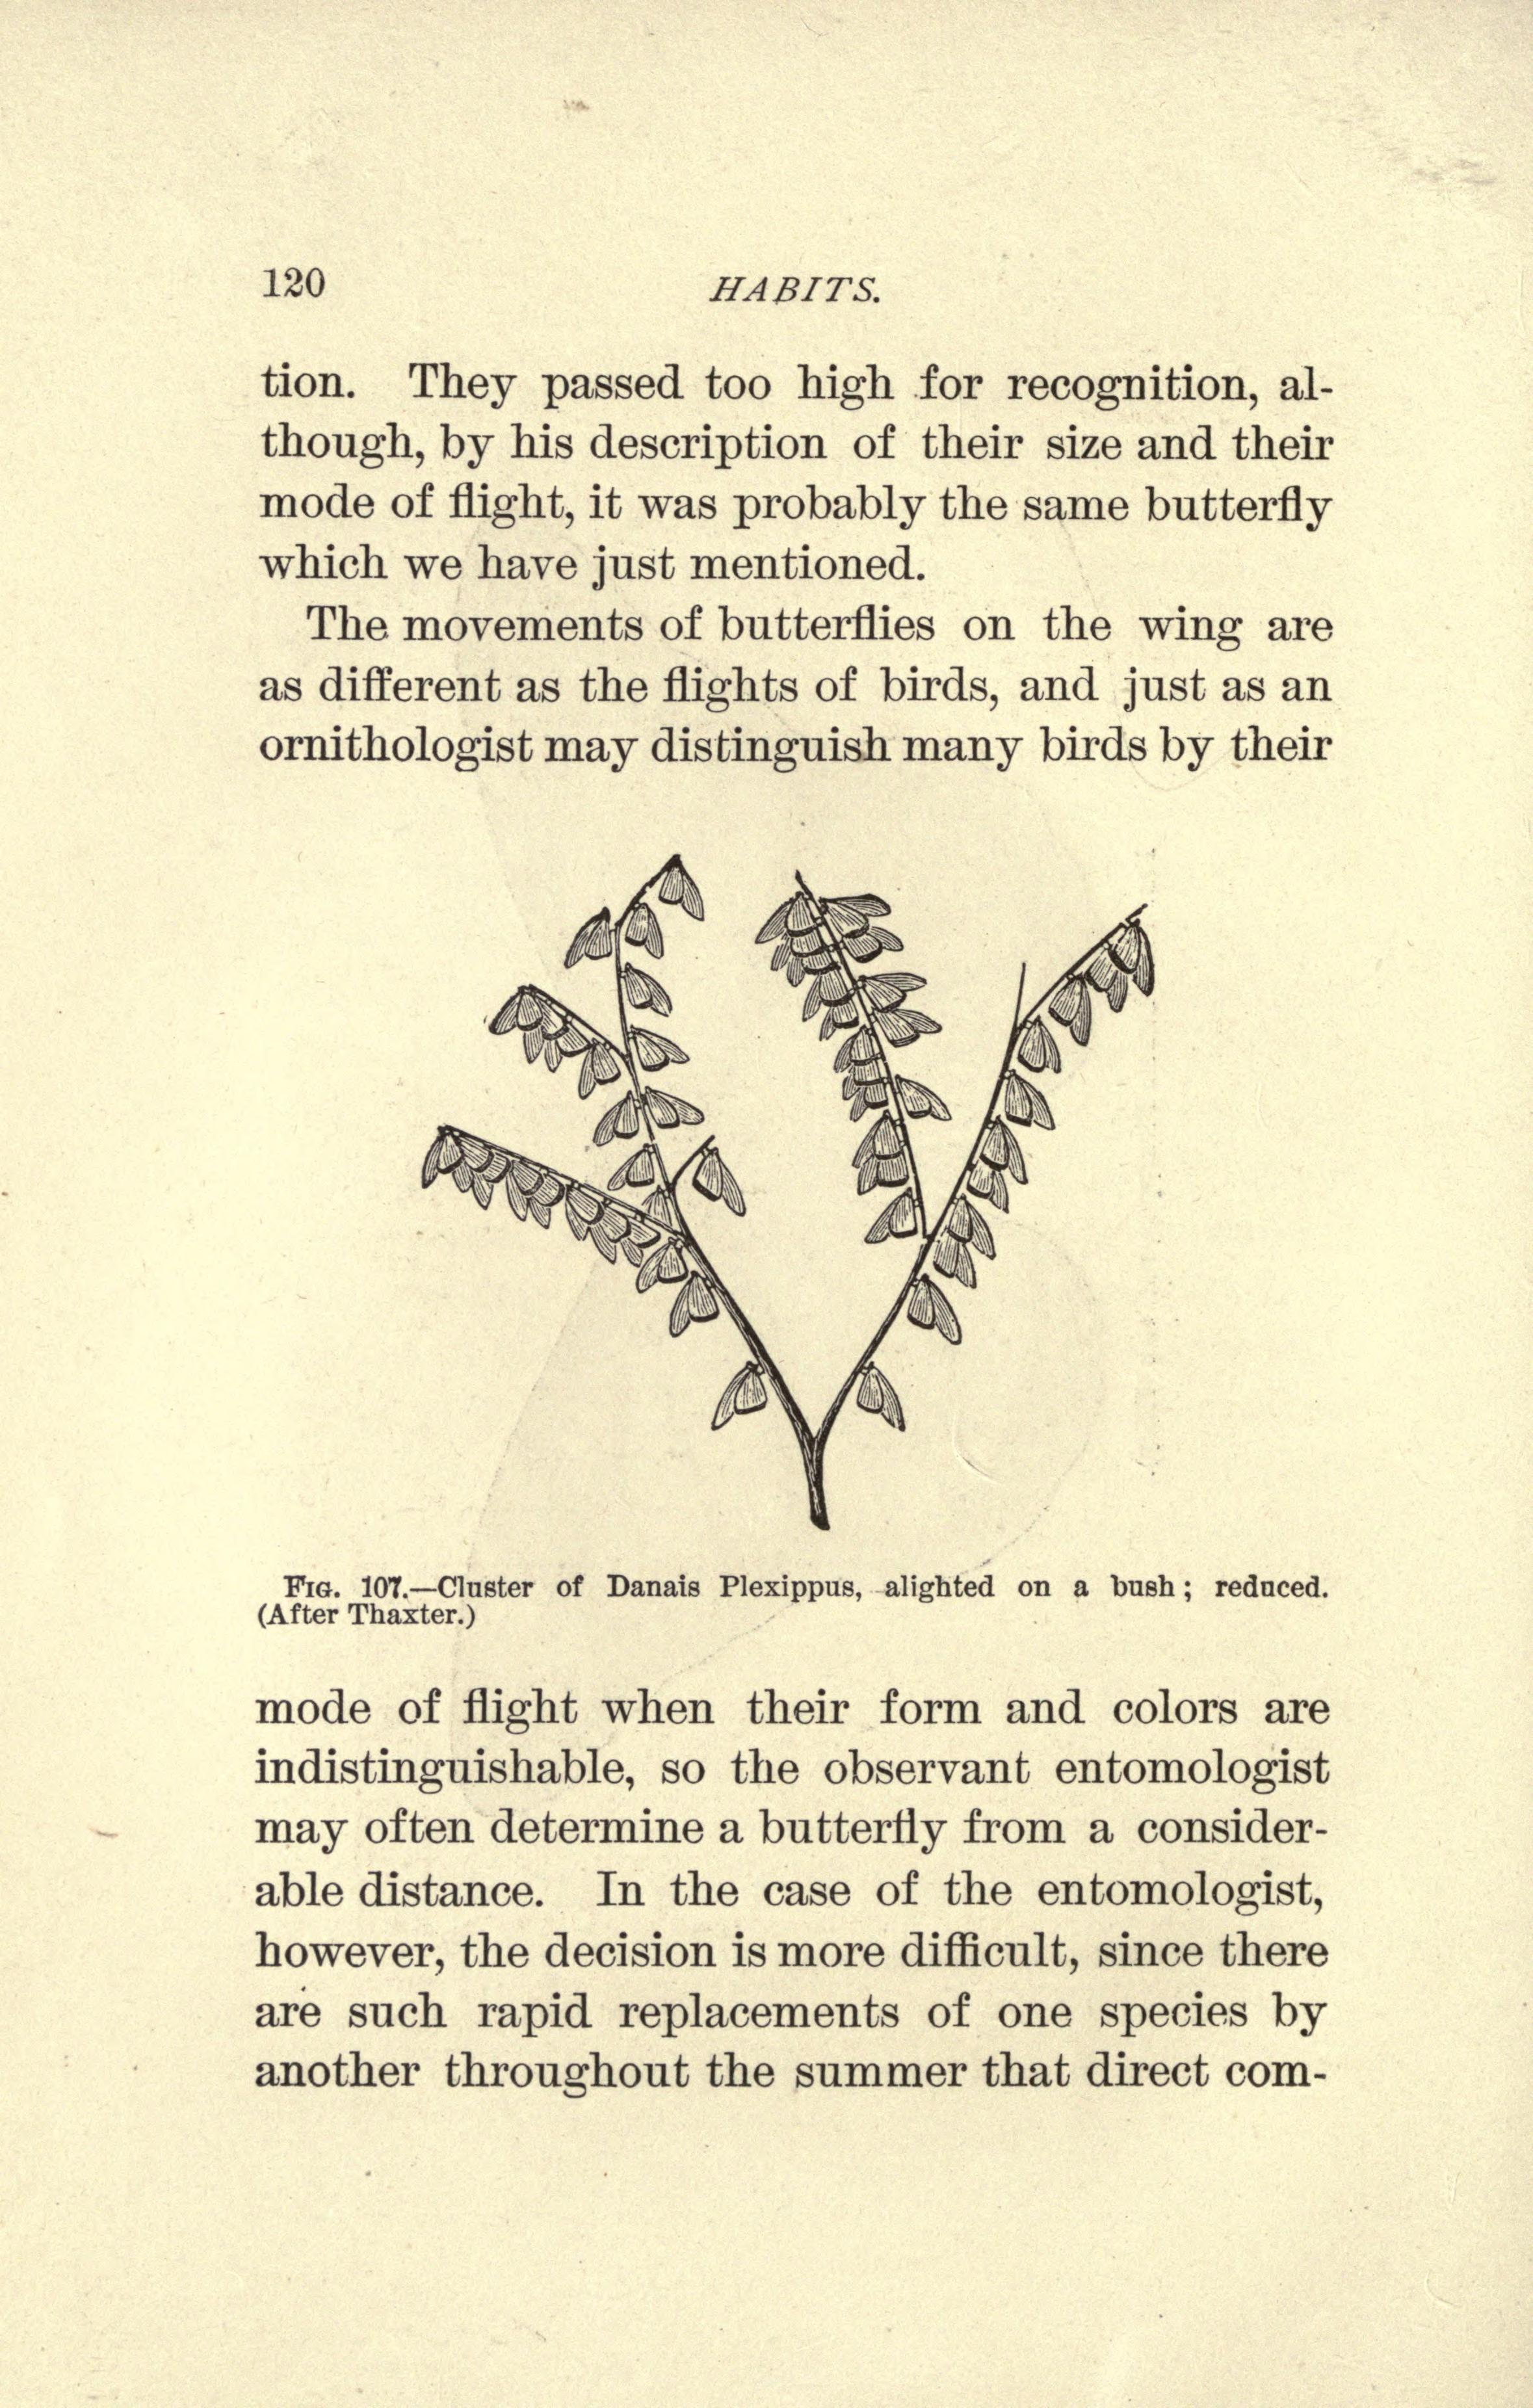 File:erflies (Page 120) BHL19200255.jpg - Wikimedia Commons